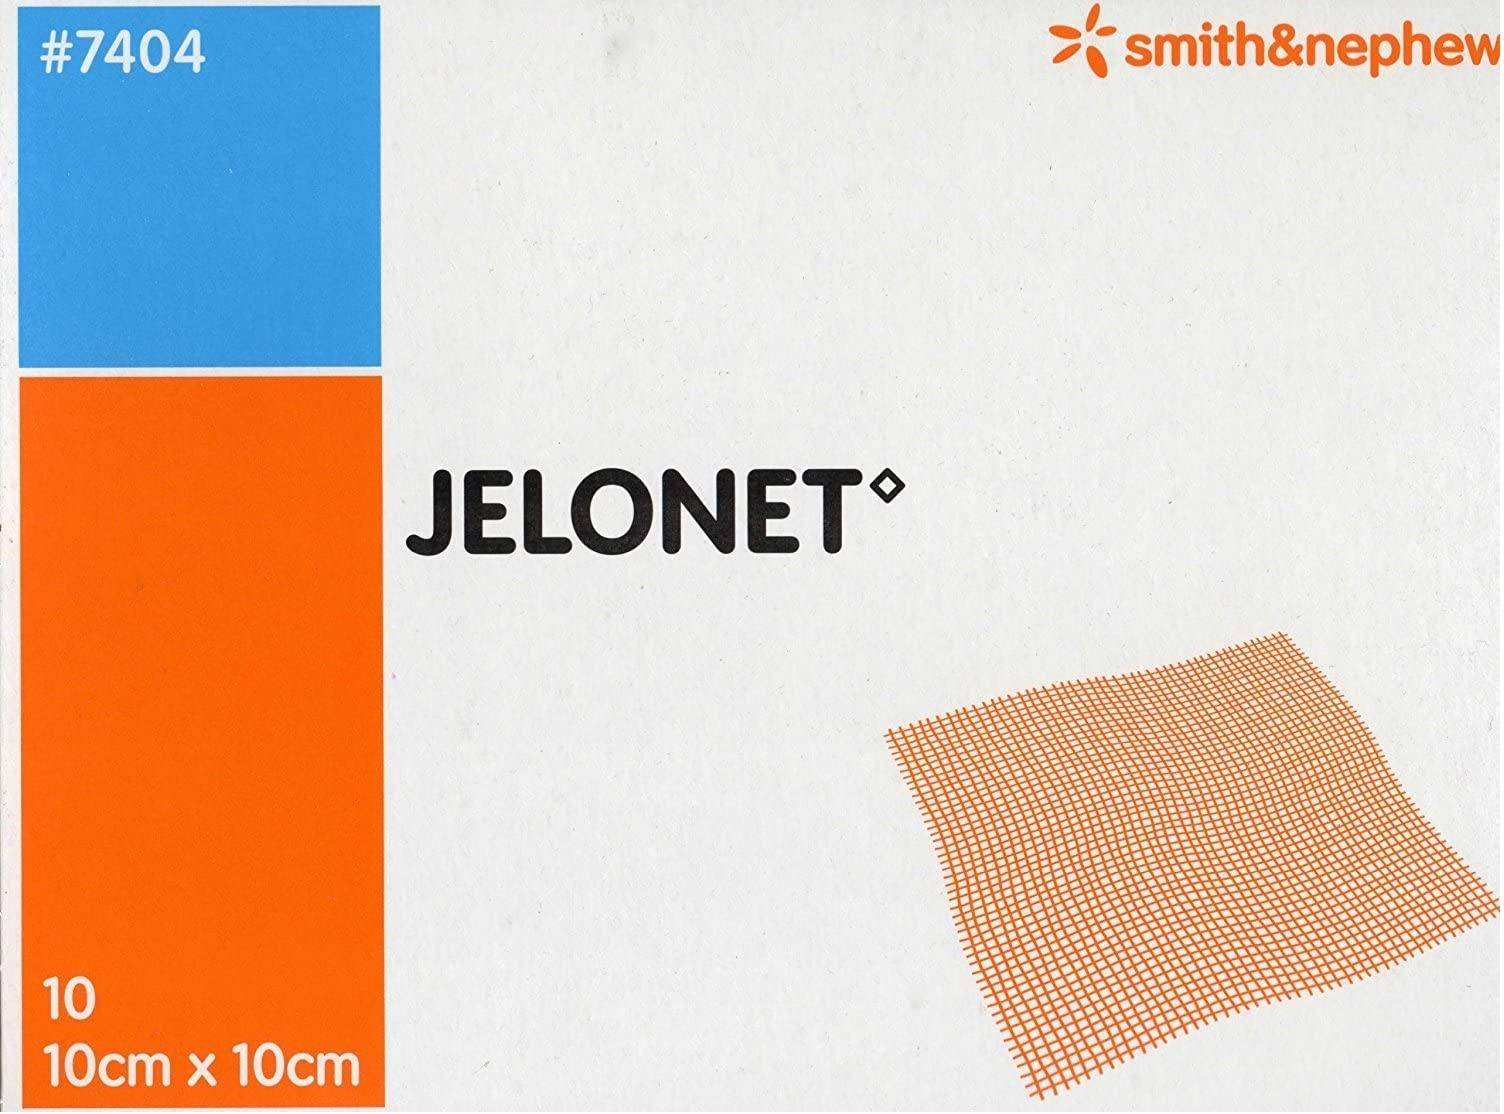 Jelonet Paraffin Gauze Dressing 10cm x 10cm   Medical Supermarket